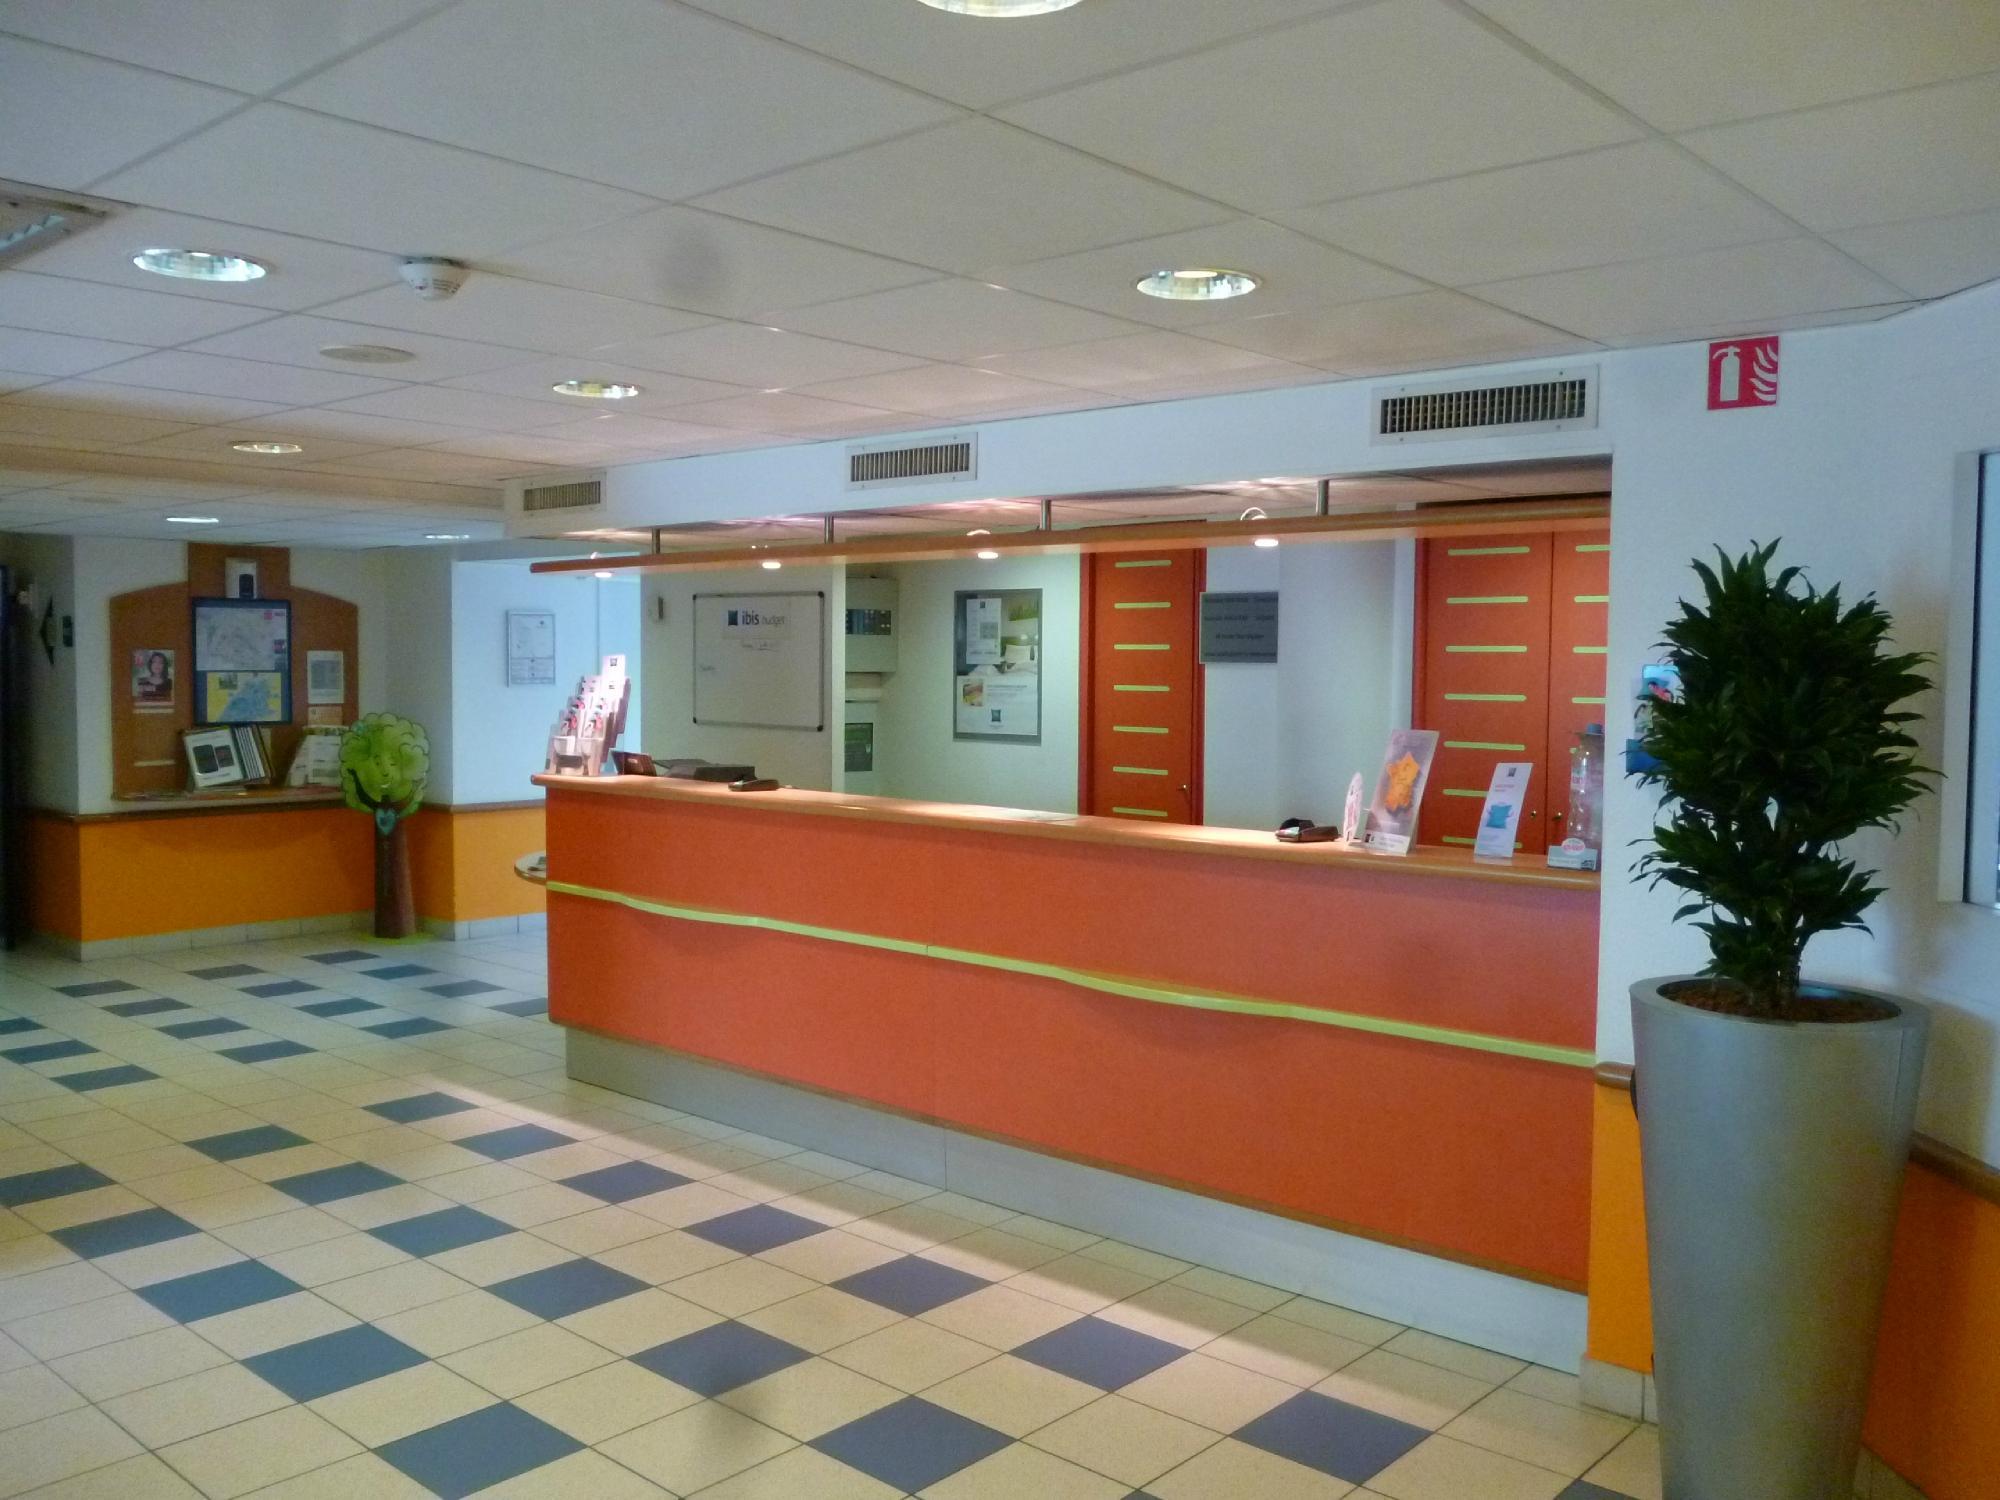 ibis budget porte d italie ouest hotel reviews prices photos kremlin bicetre